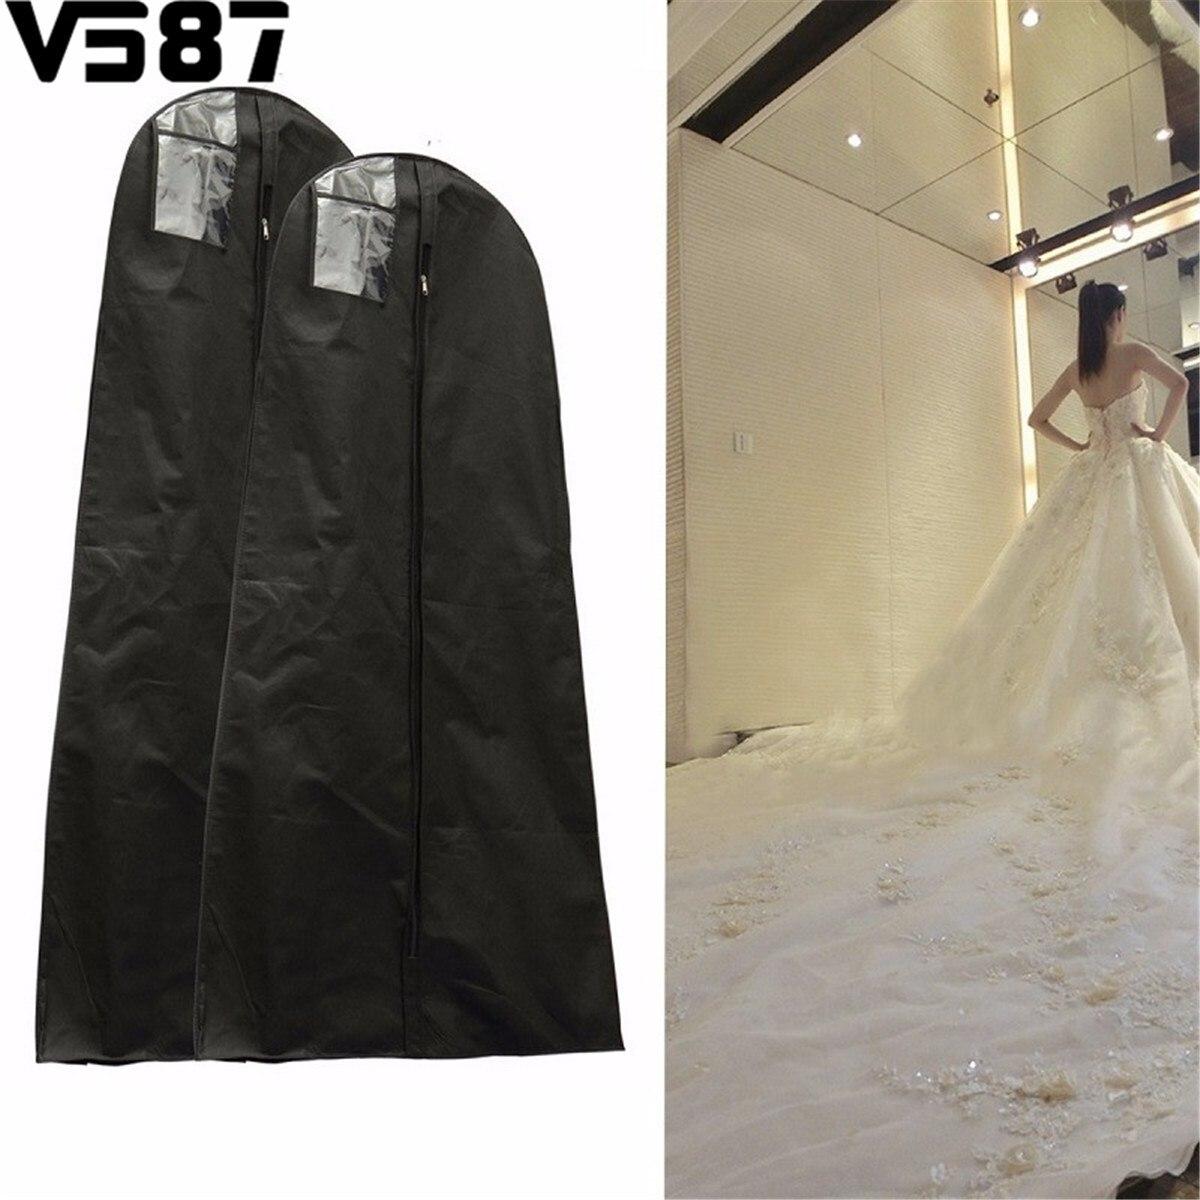 1 6 8m Waterproof Wedding Gown Bag Bridal Dresses Dustproof Protective Cover Home Closet